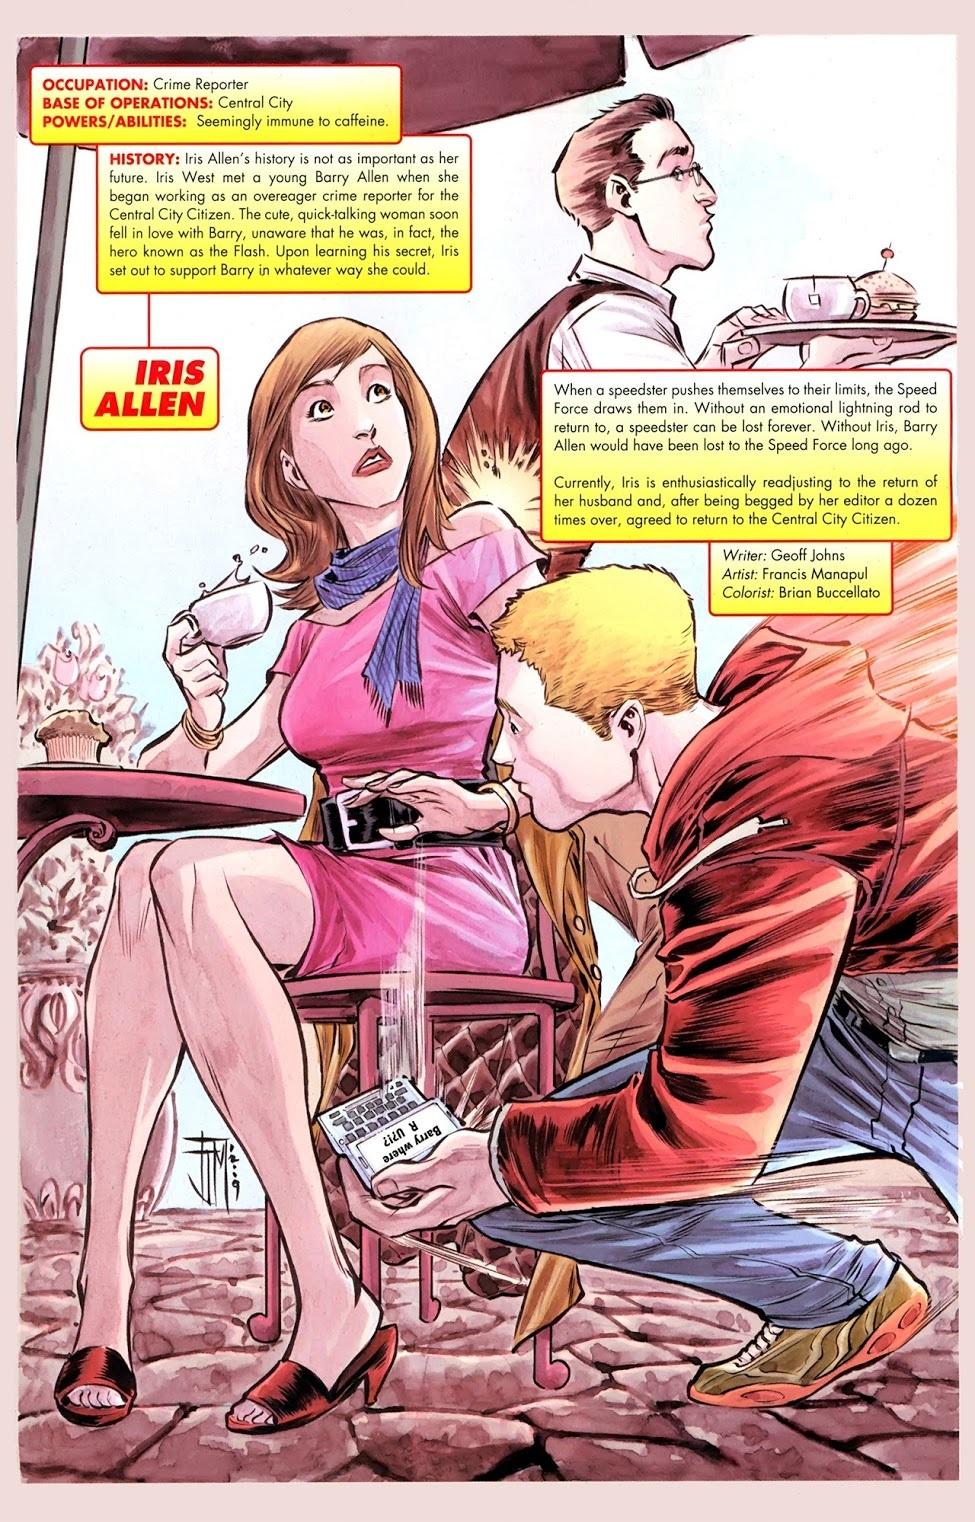 Iris Ann West Allen y Barry Allen/Flash en The Flash Secret Files & Origins #1 (noviembre de 2010). Arte por Francis Manapul. Imagen: viewcomics.me